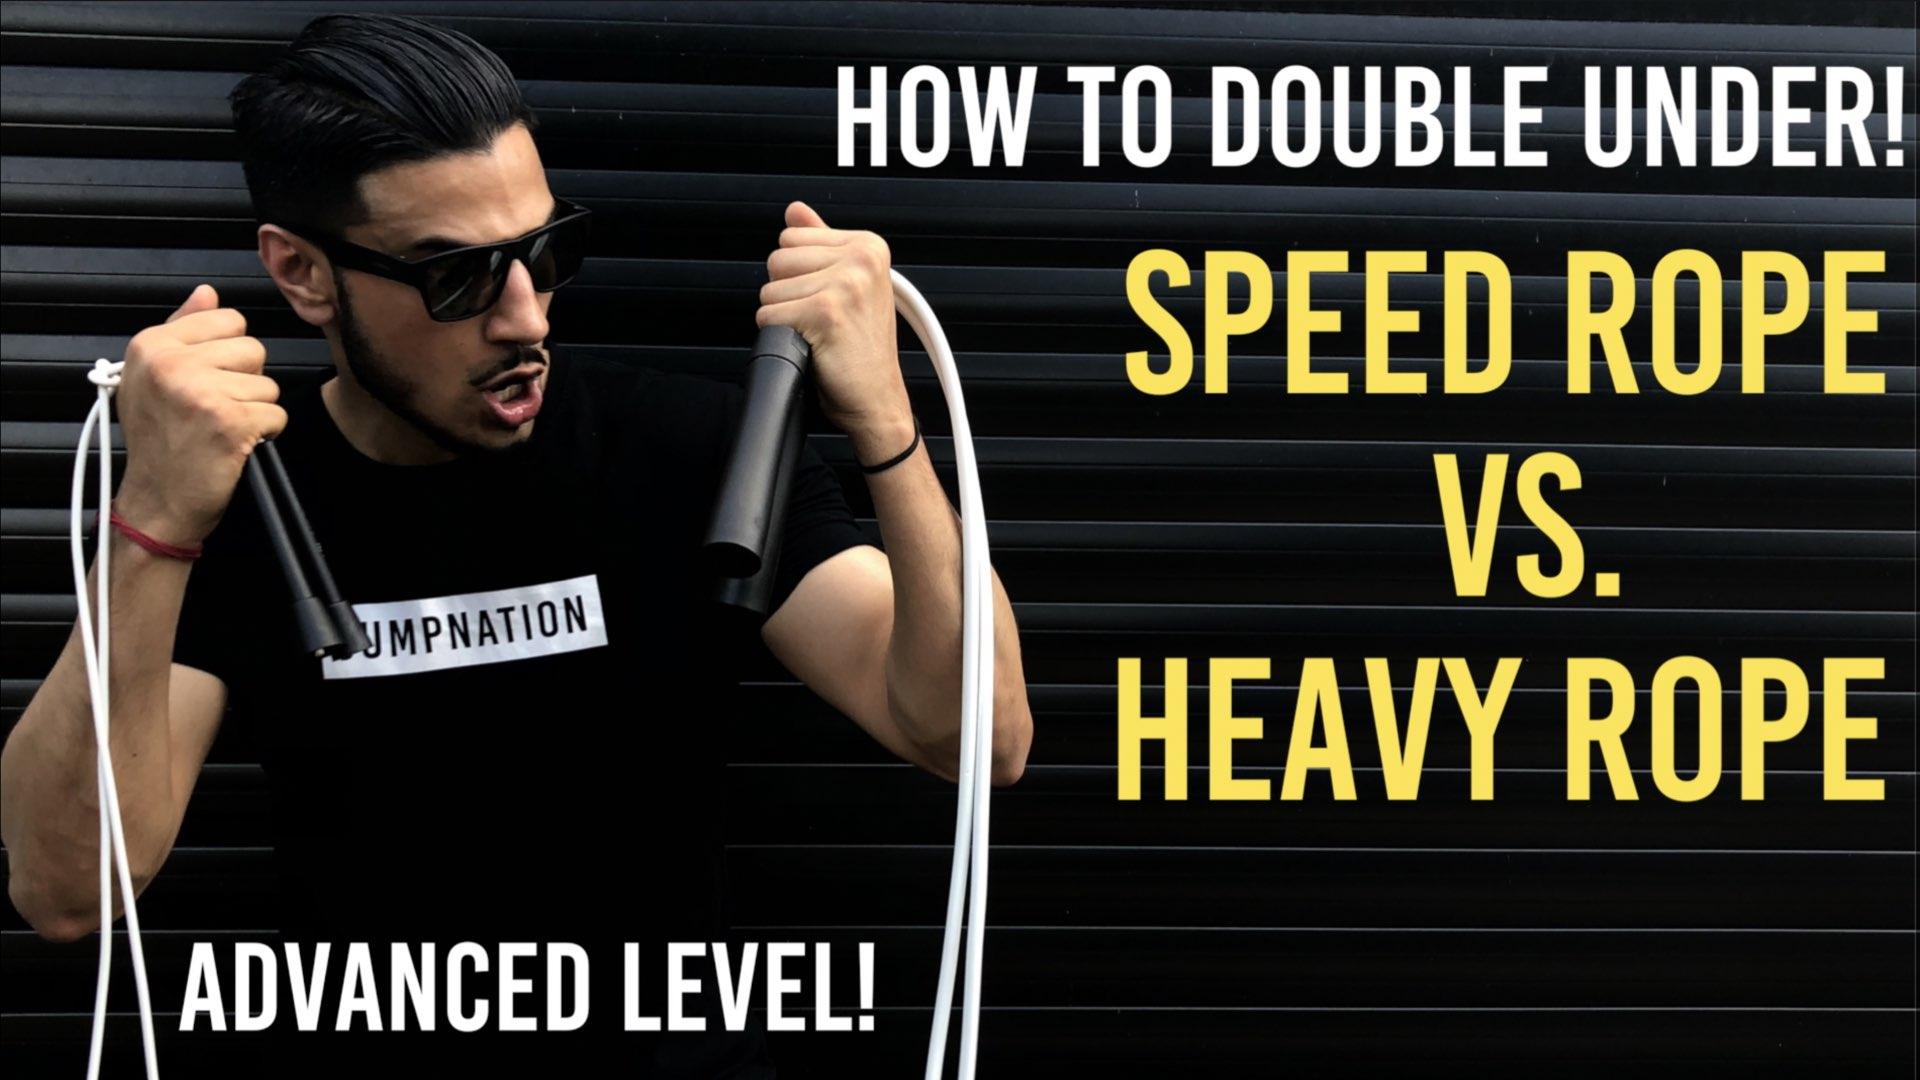 youtube thumbnails templates.063.jpeg